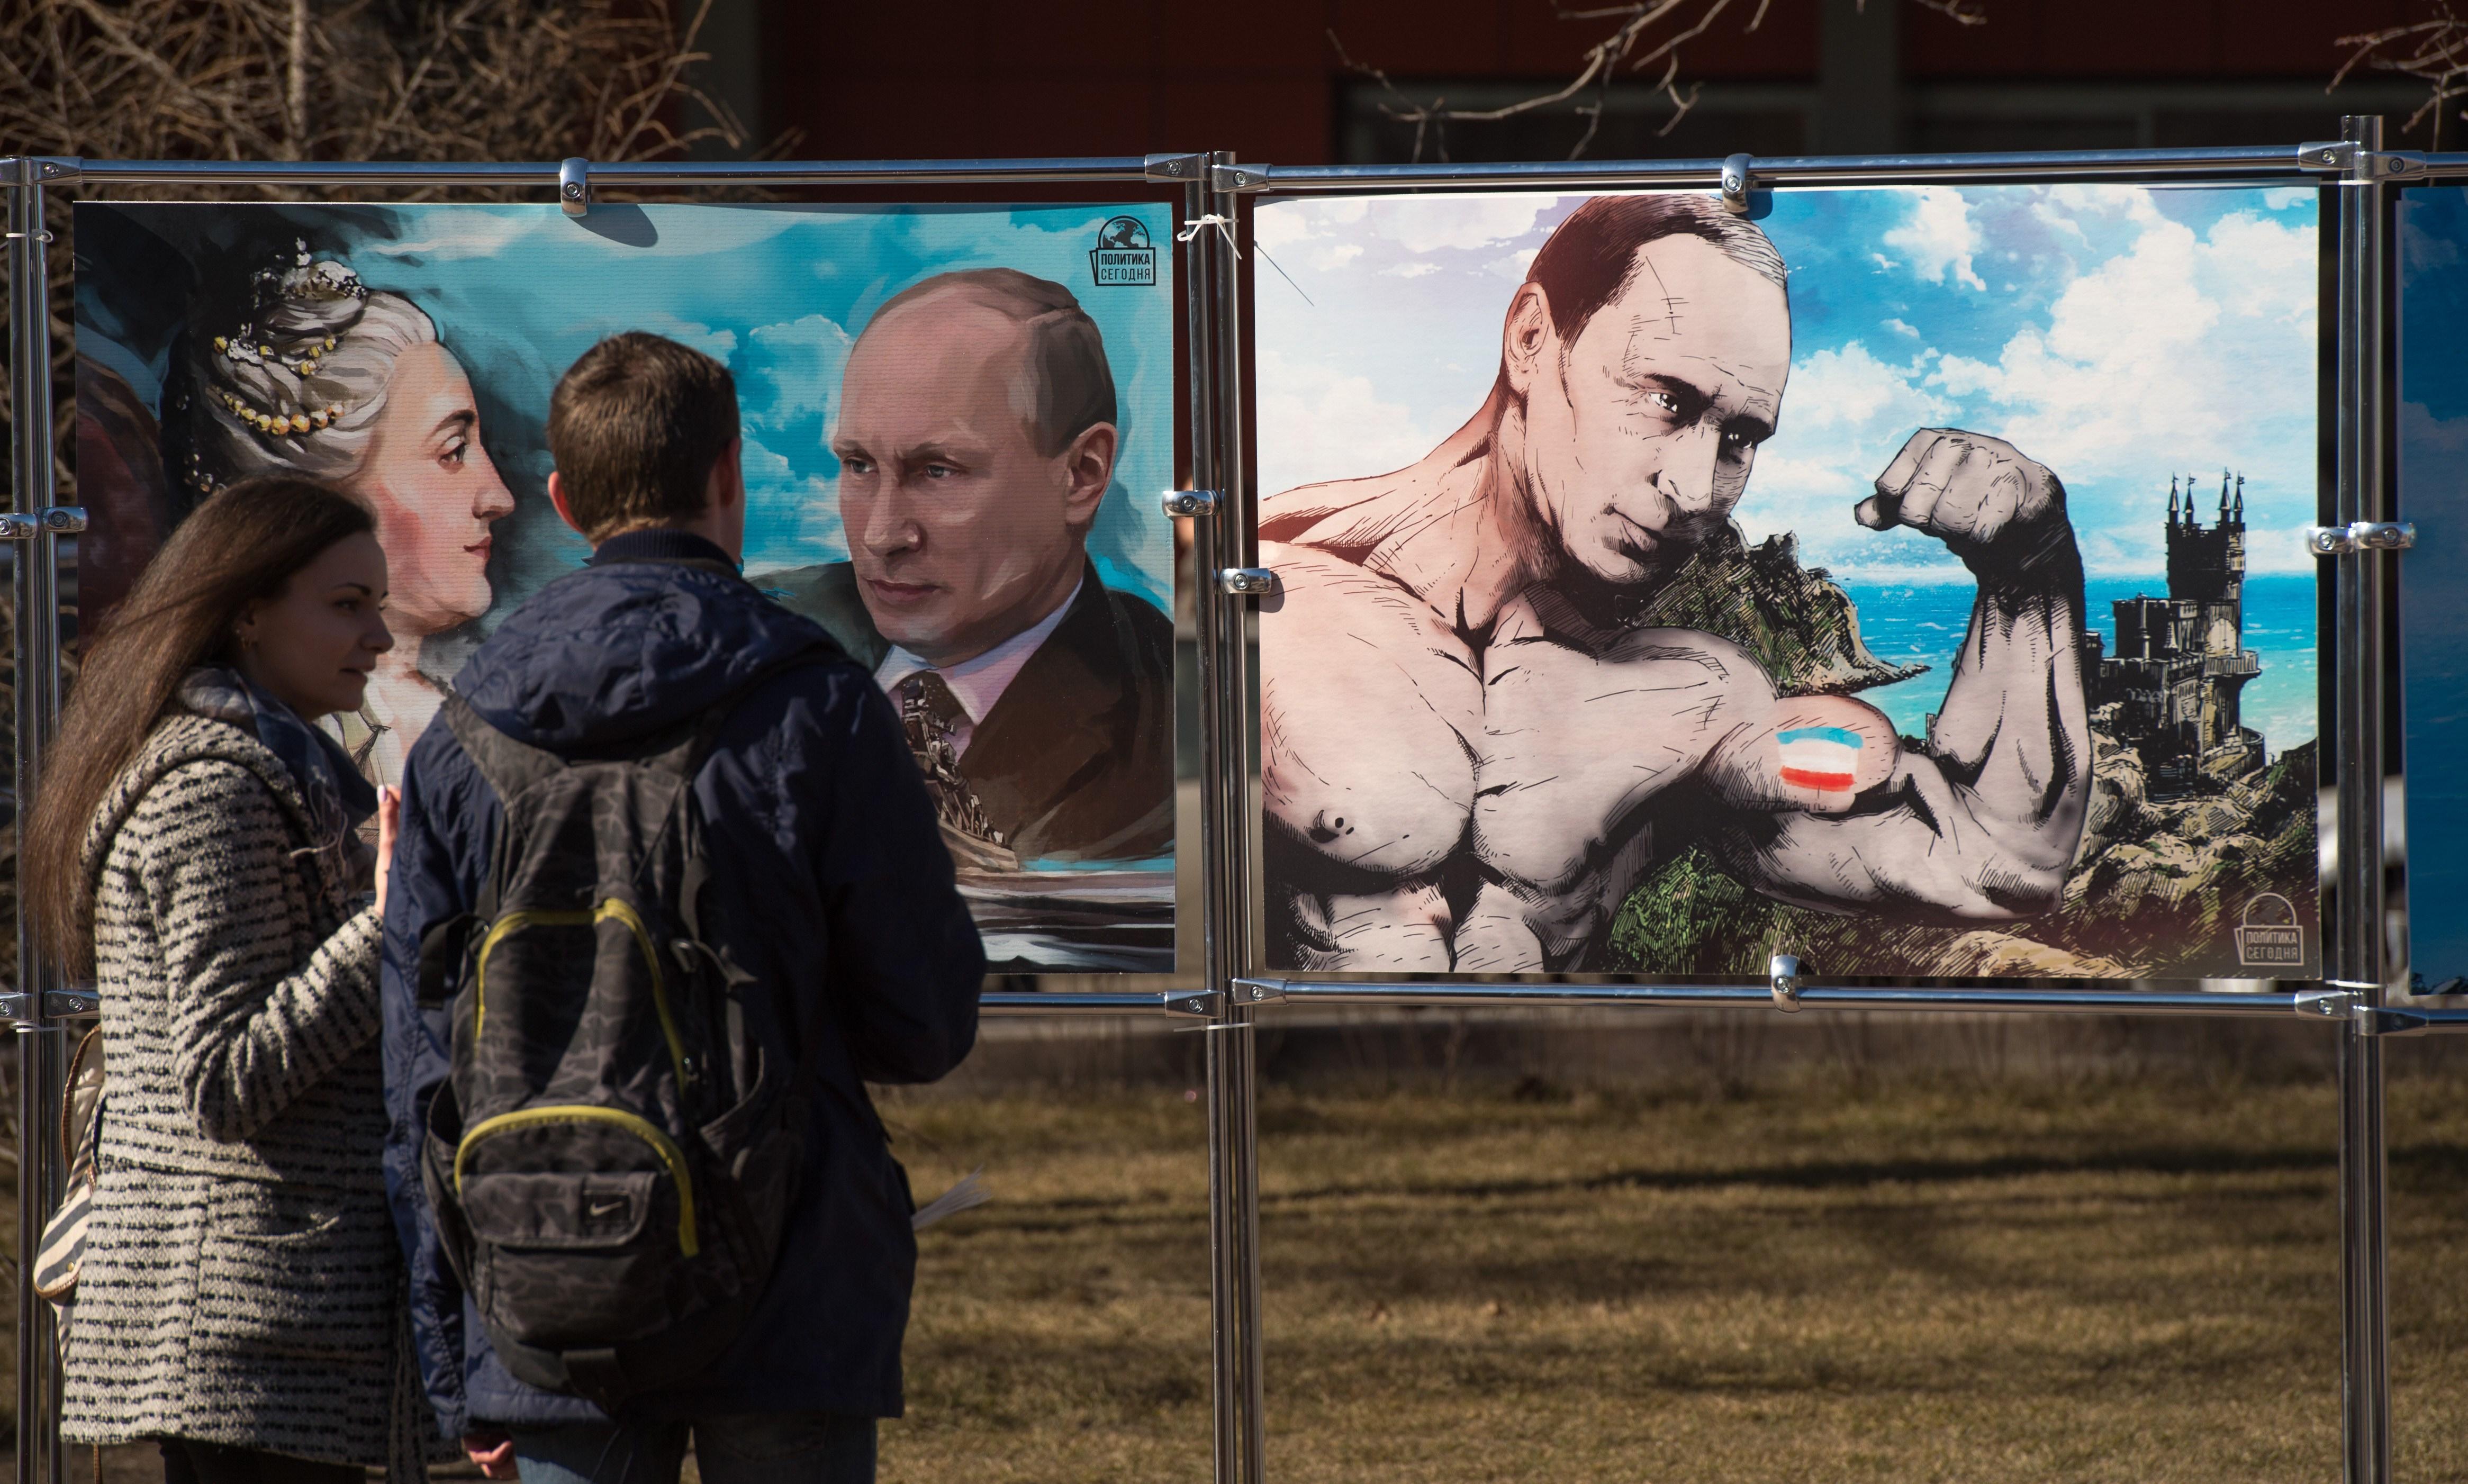 RUSSIA-UKRAINE-CRISIS-CRIMEA-ANNIVERSARY-CARTOONS-EXHIBITION